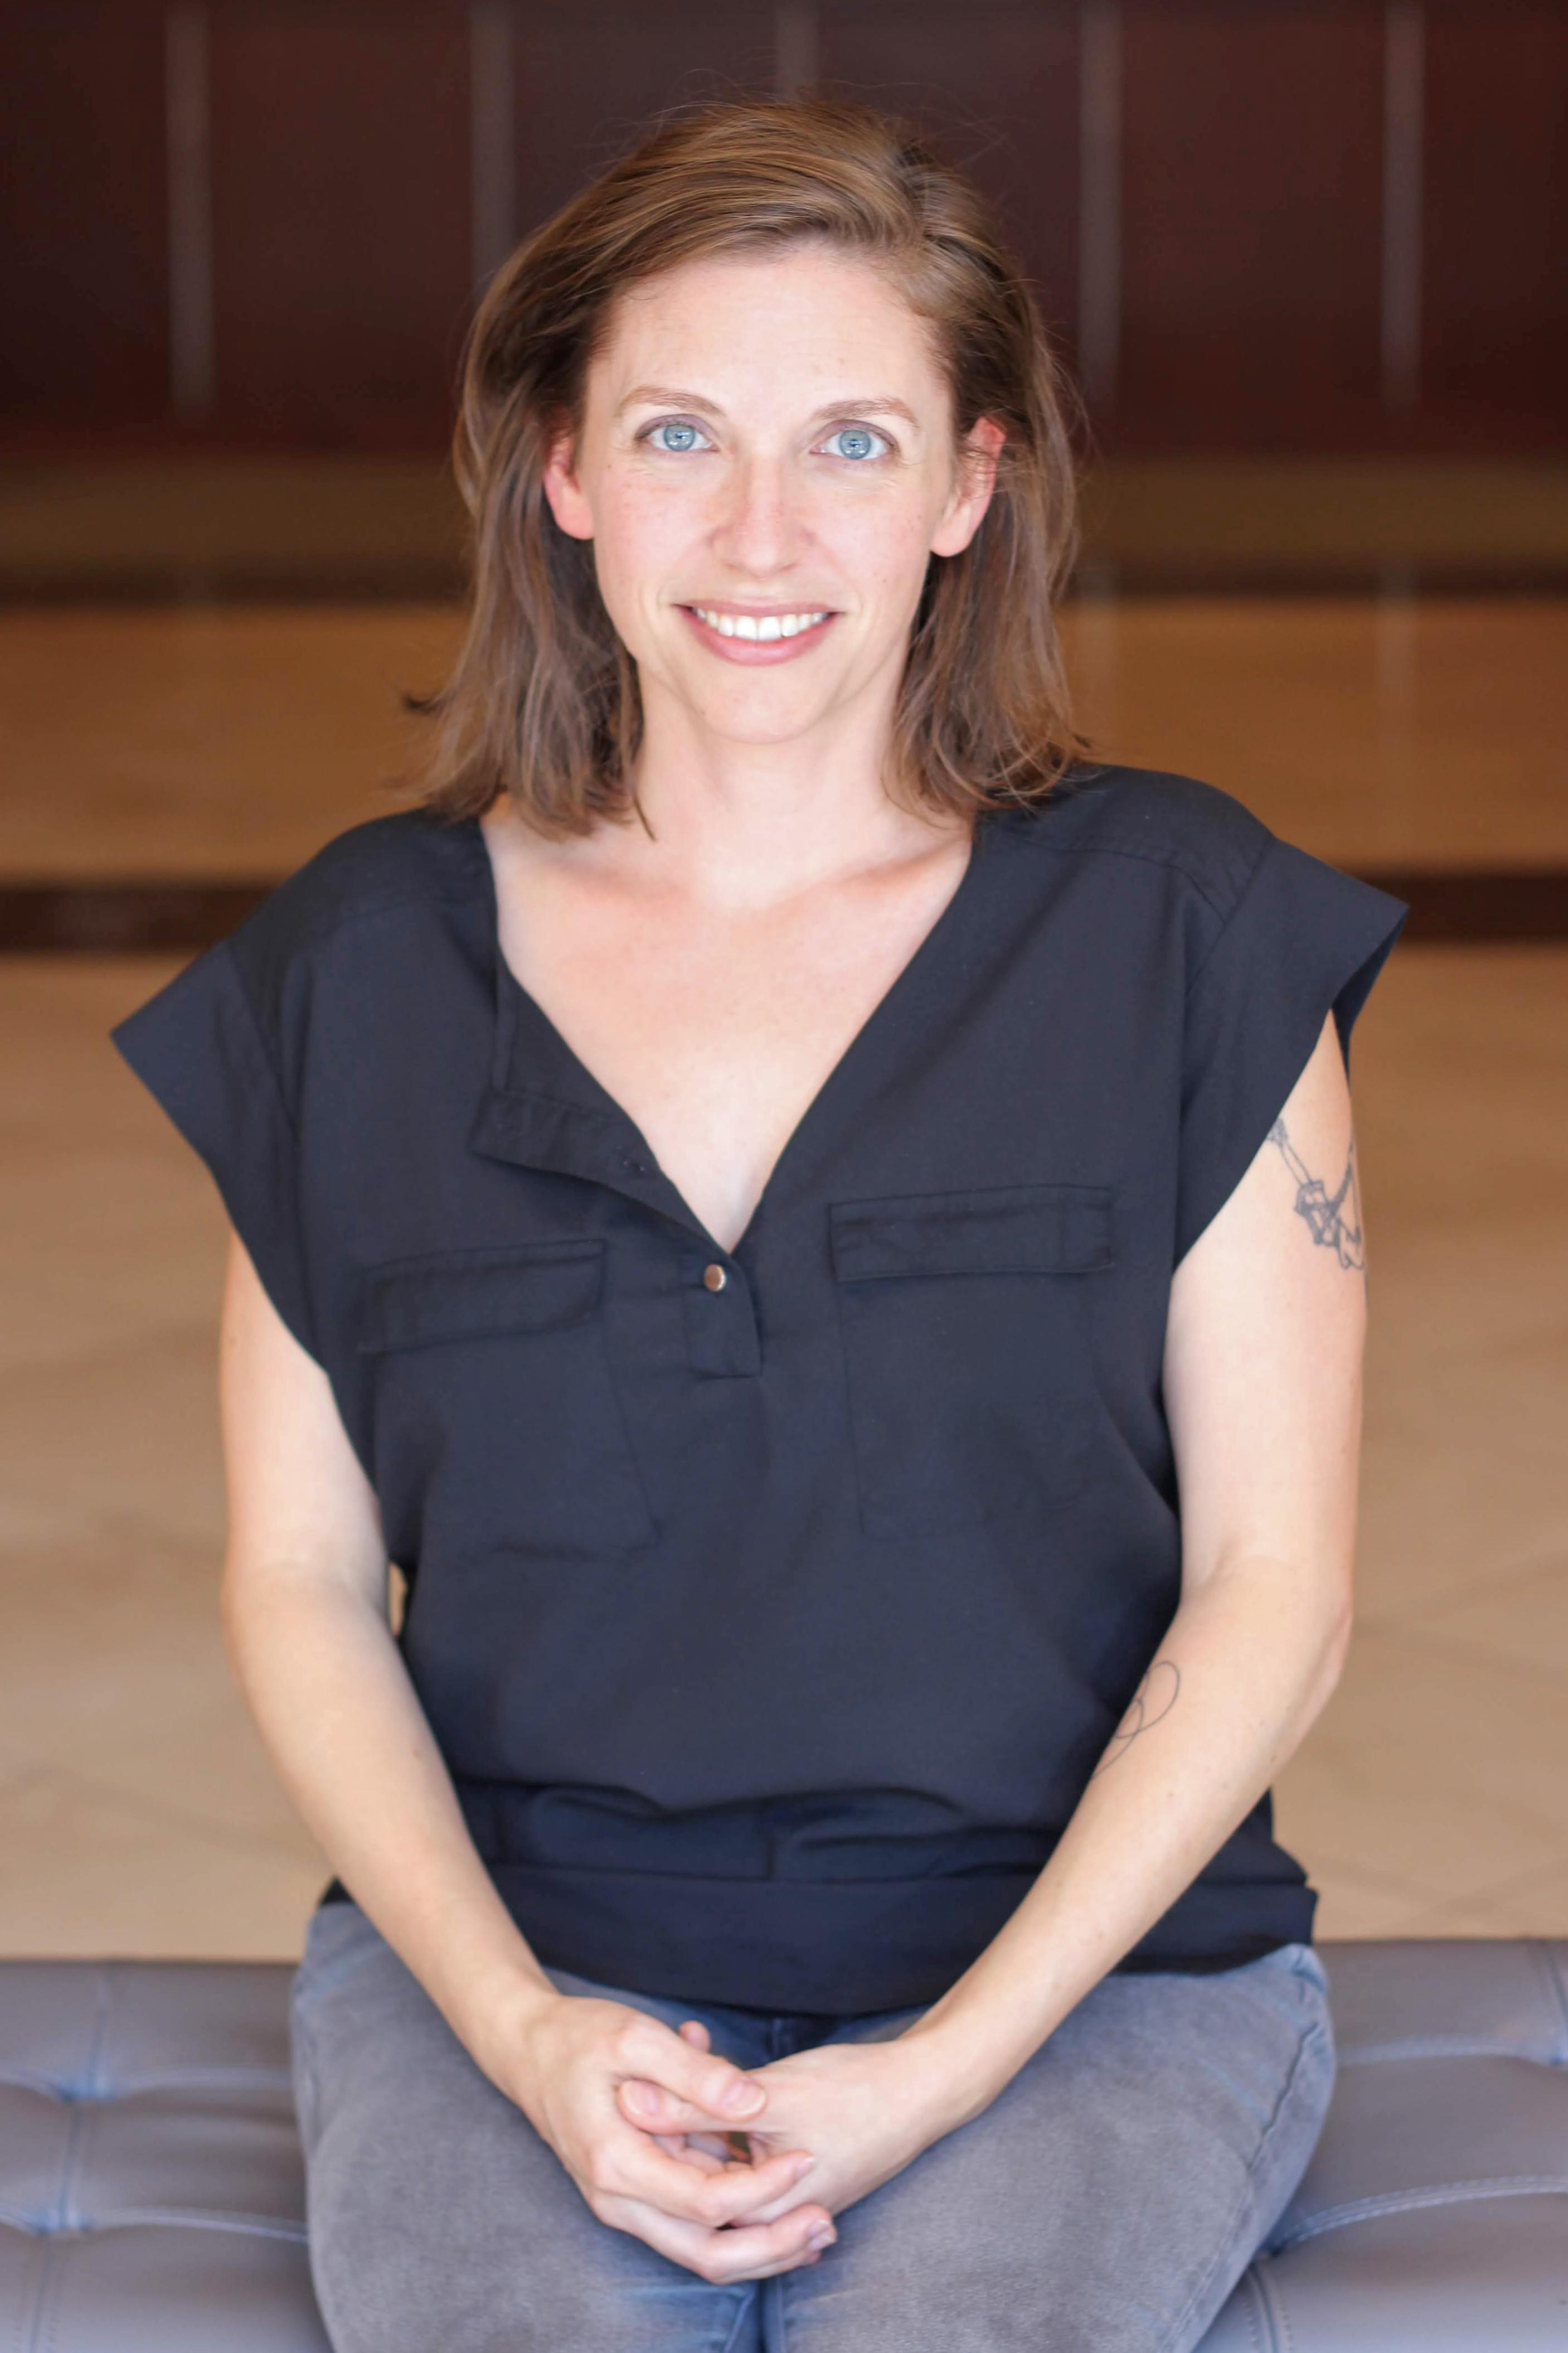 Liz Radzicki